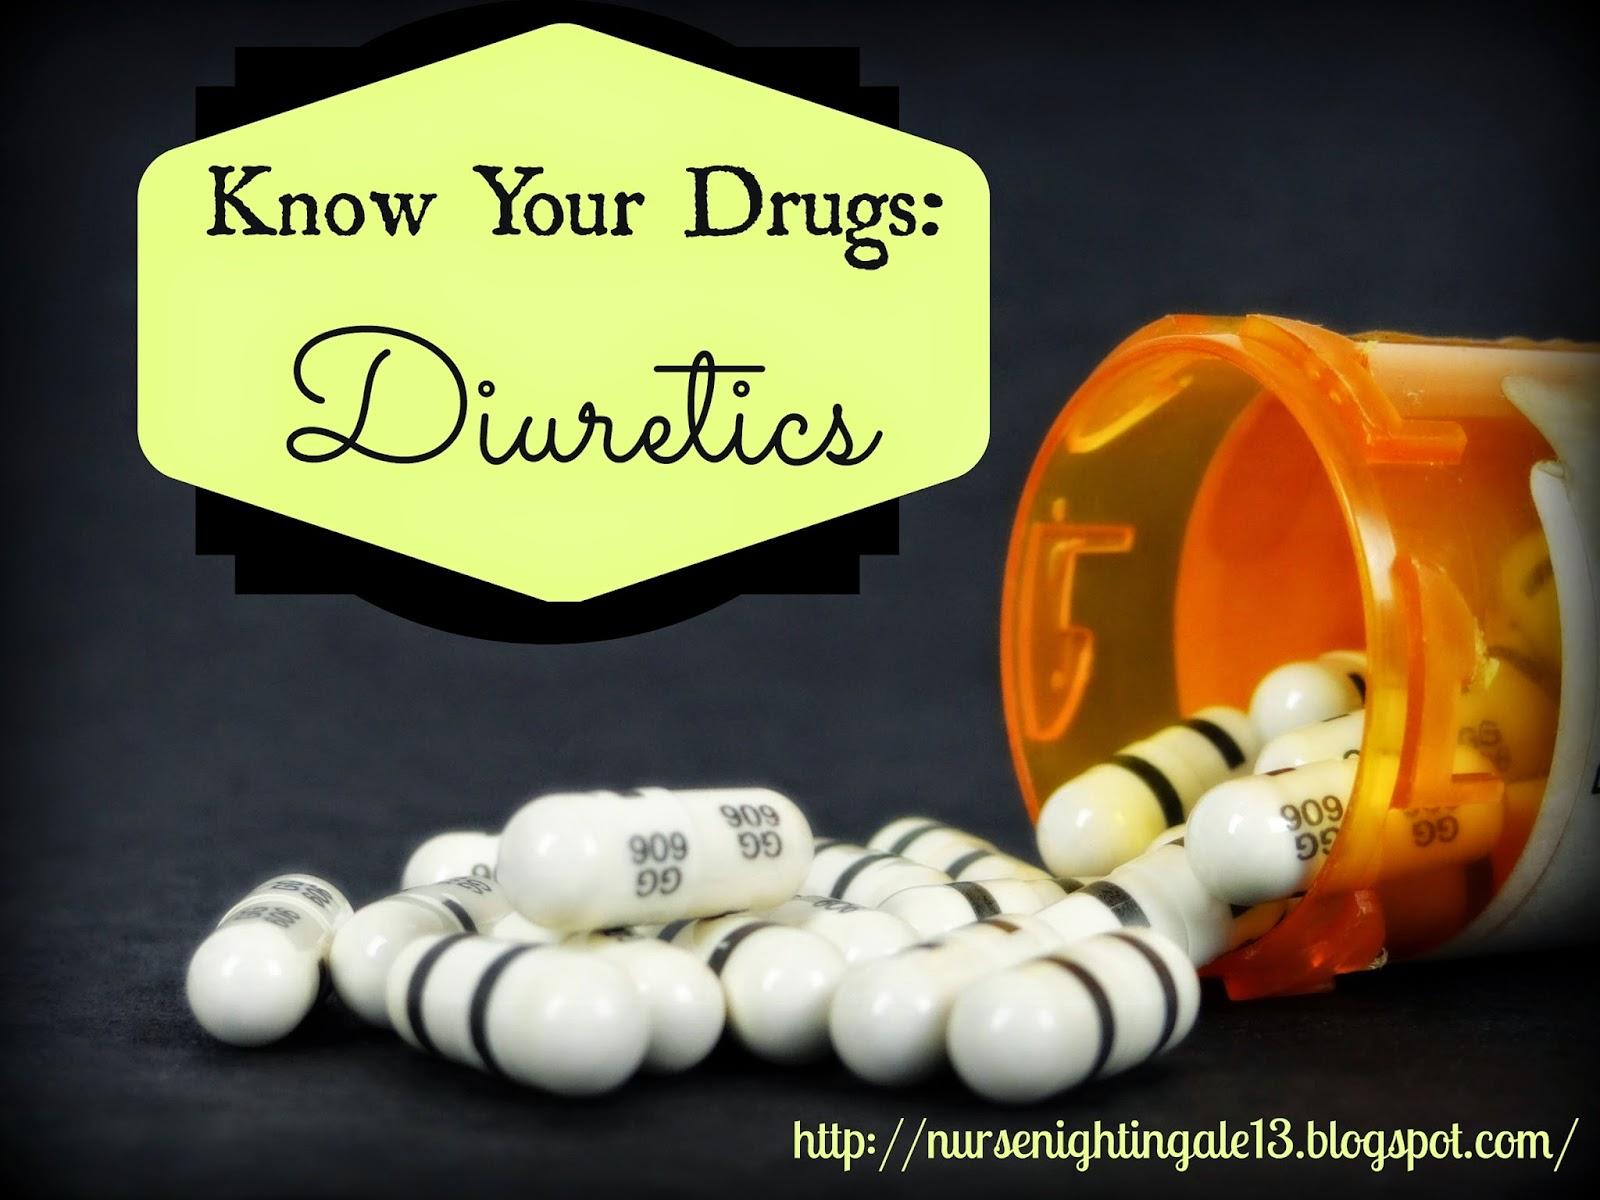 Pharmacology, Drugs, Diuretics, Kidneys, Potassium, Medicine, Renal